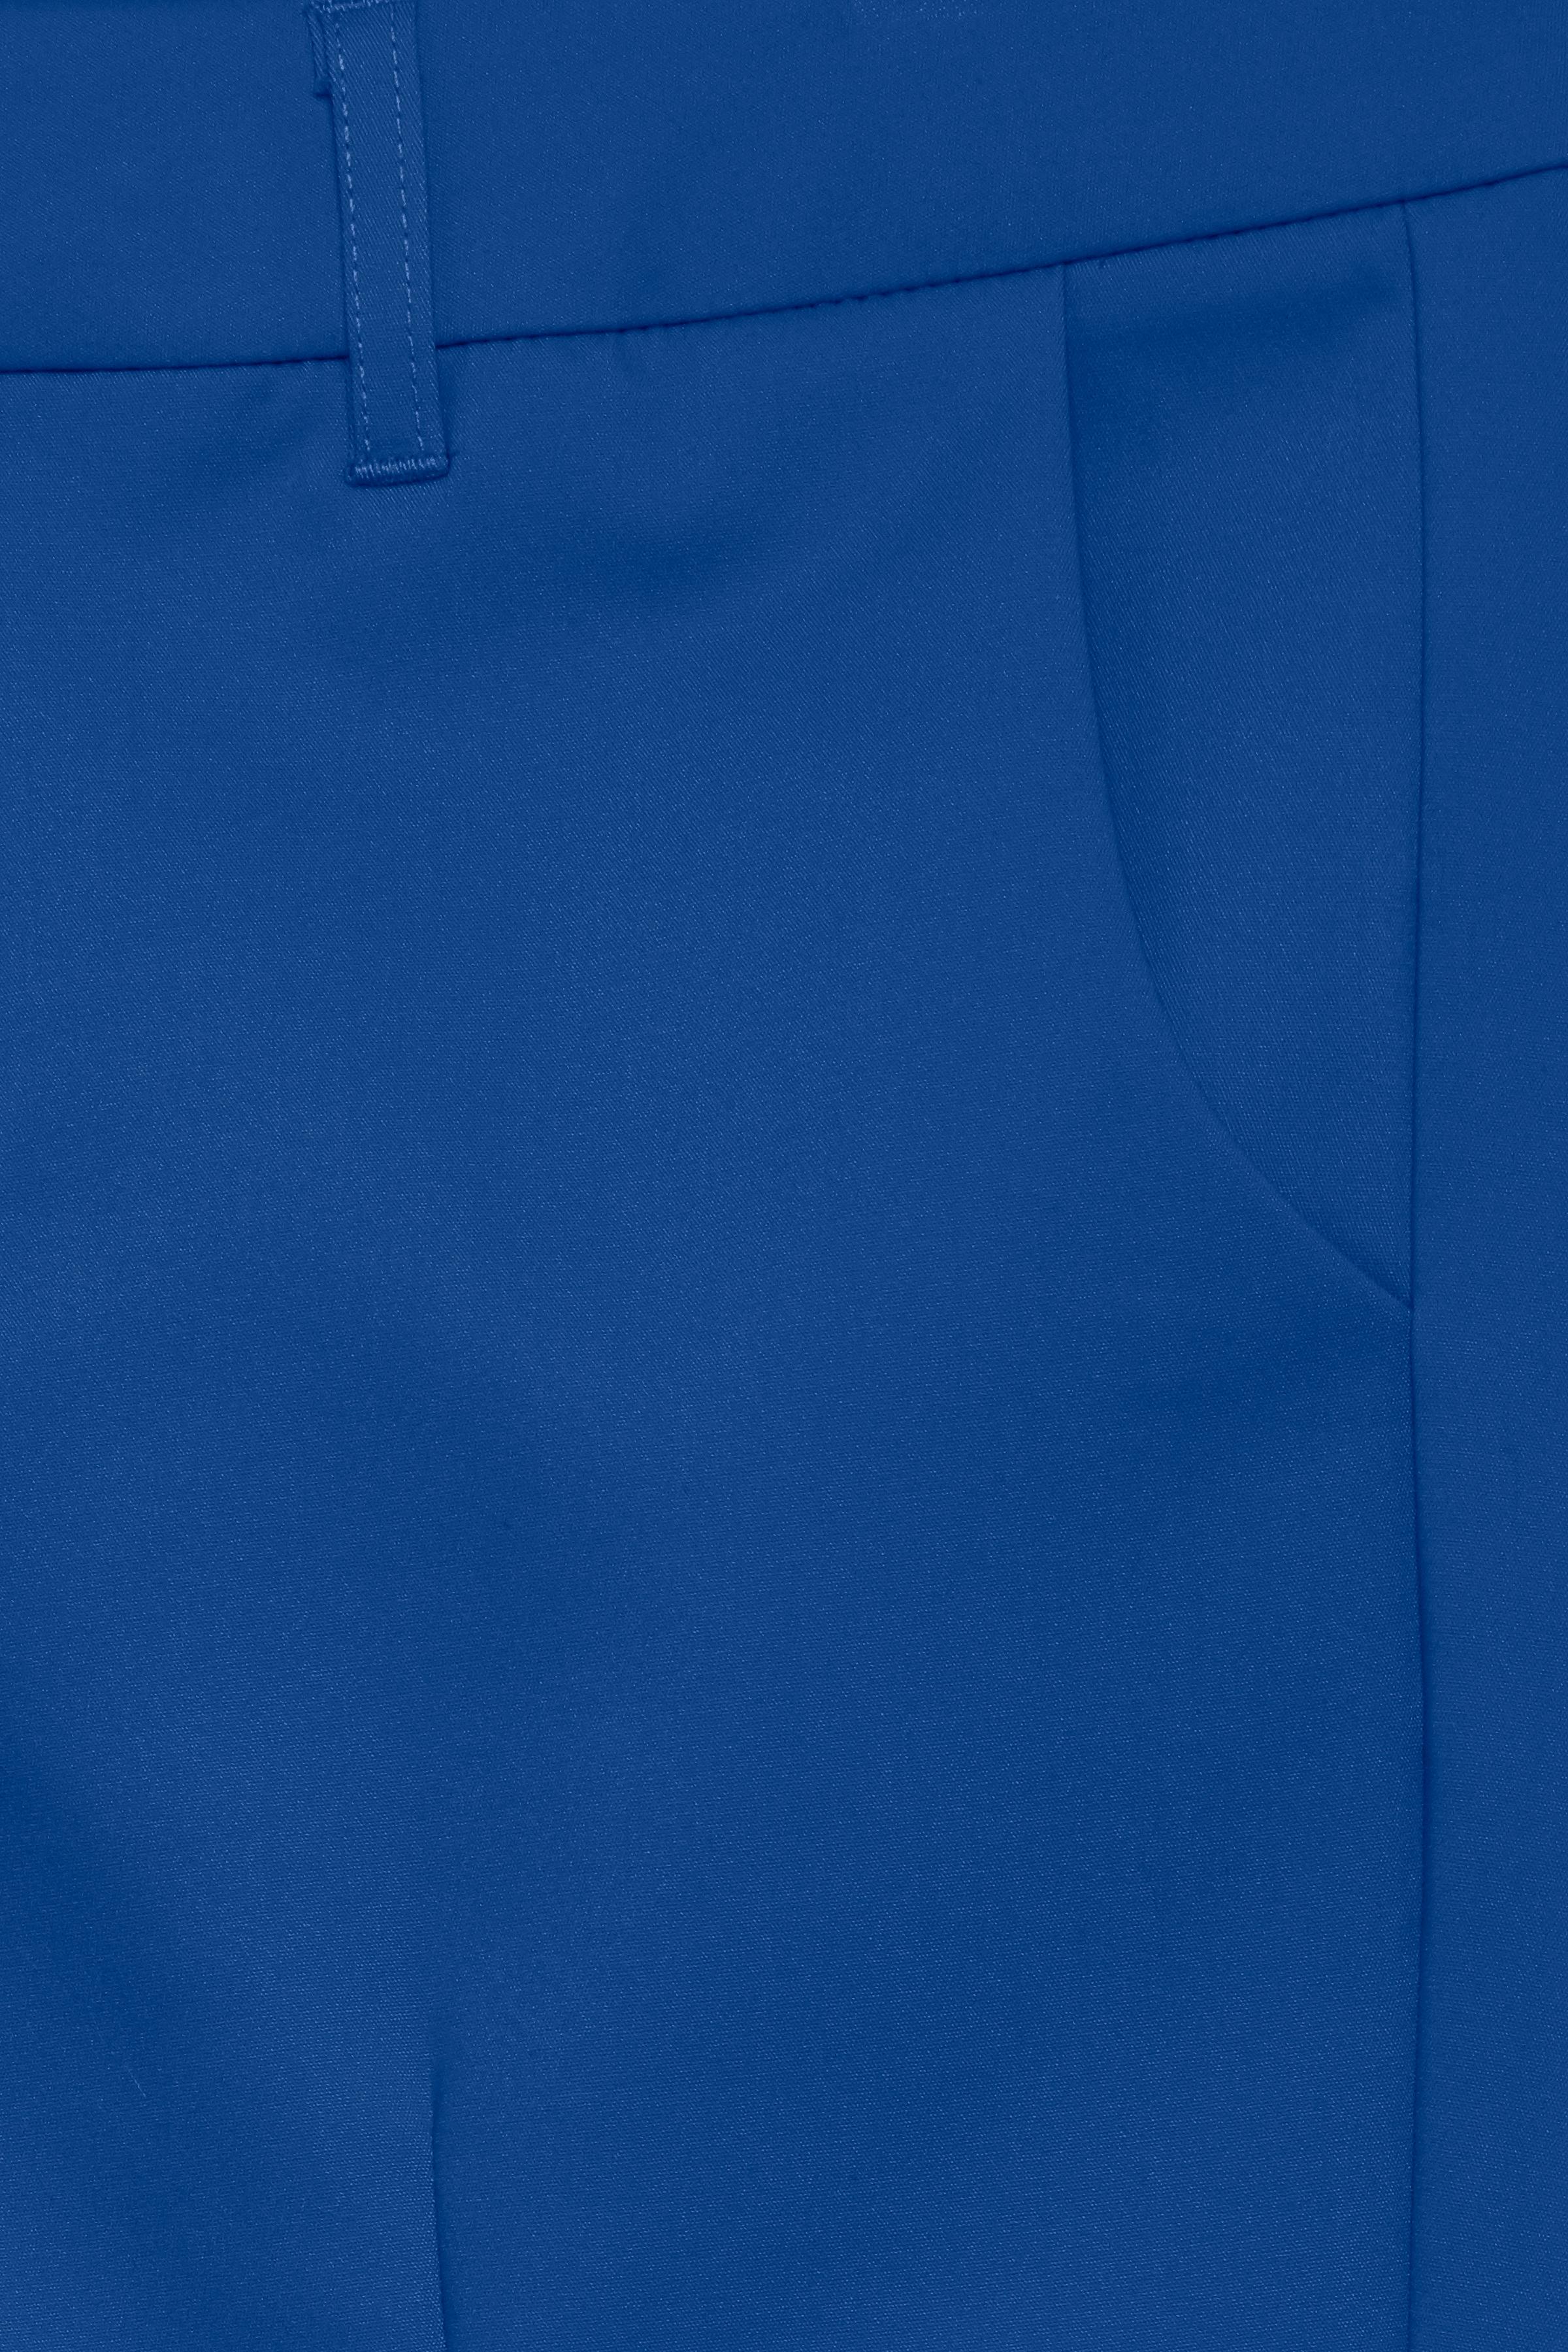 Twilight Blue Casual byxor från Pulz Jeans – Köp Twilight Blue Casual byxor från stl. 32-46 här